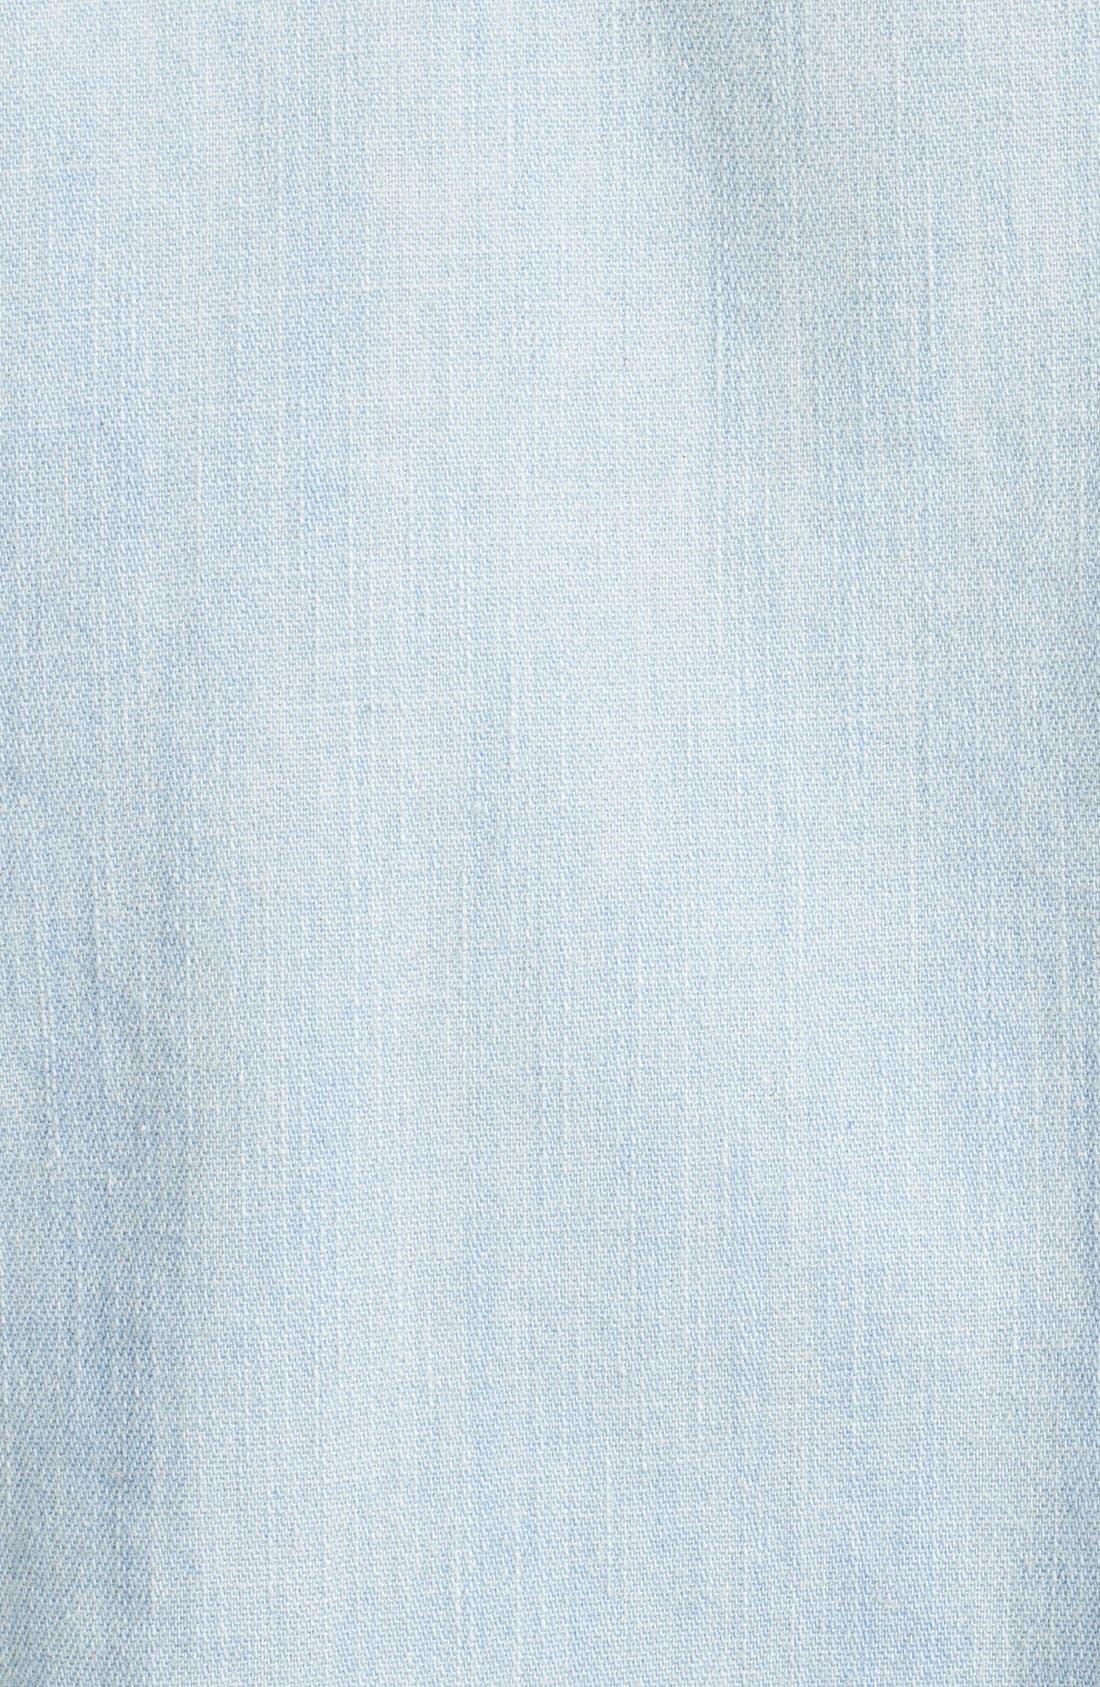 Alternate Image 3  - Current/Elliott 'The Perfect' Button Front Denim Shirt